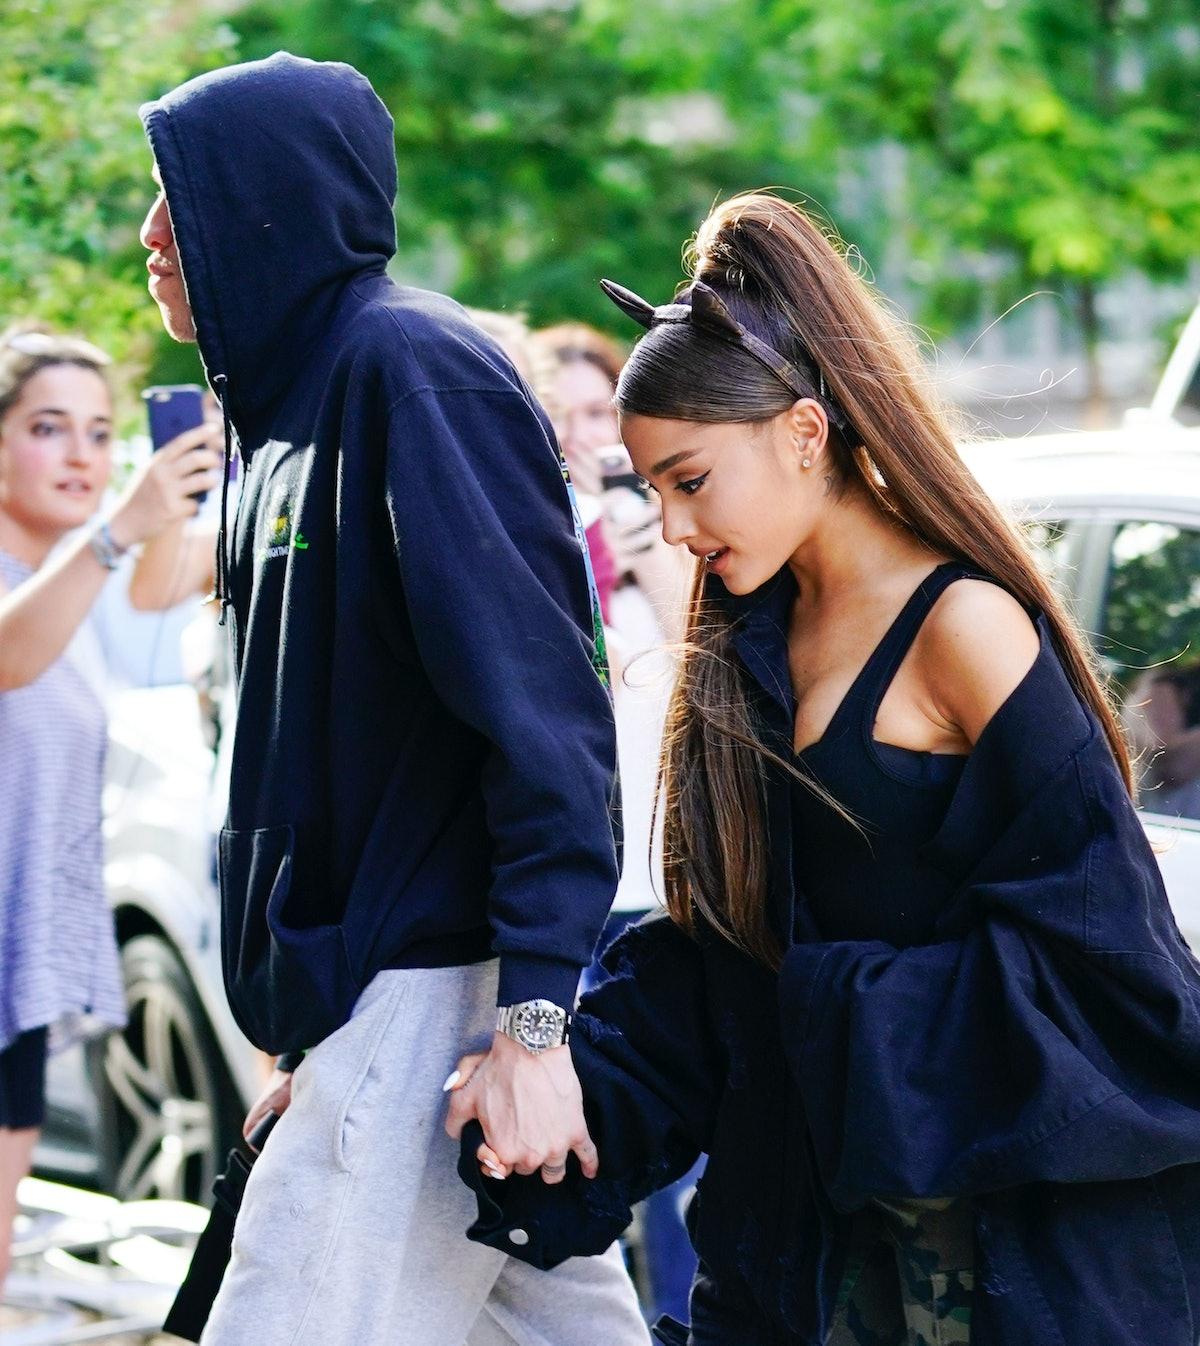 Ariana Grande Wears a Sweatshirt with Pete Davidson's Face on it 1